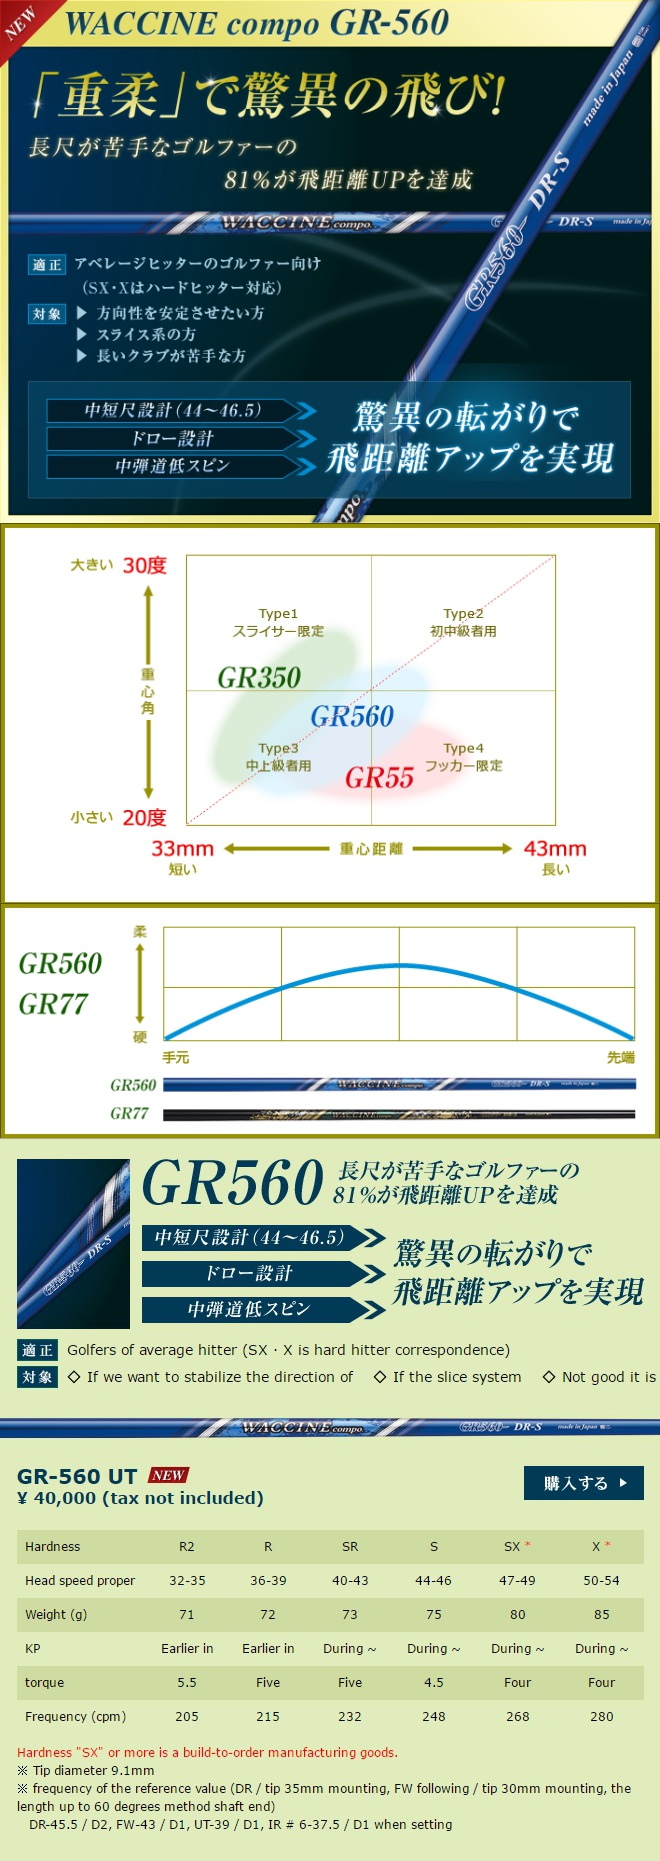 Waccine Compo GR-560 Utility Shaft